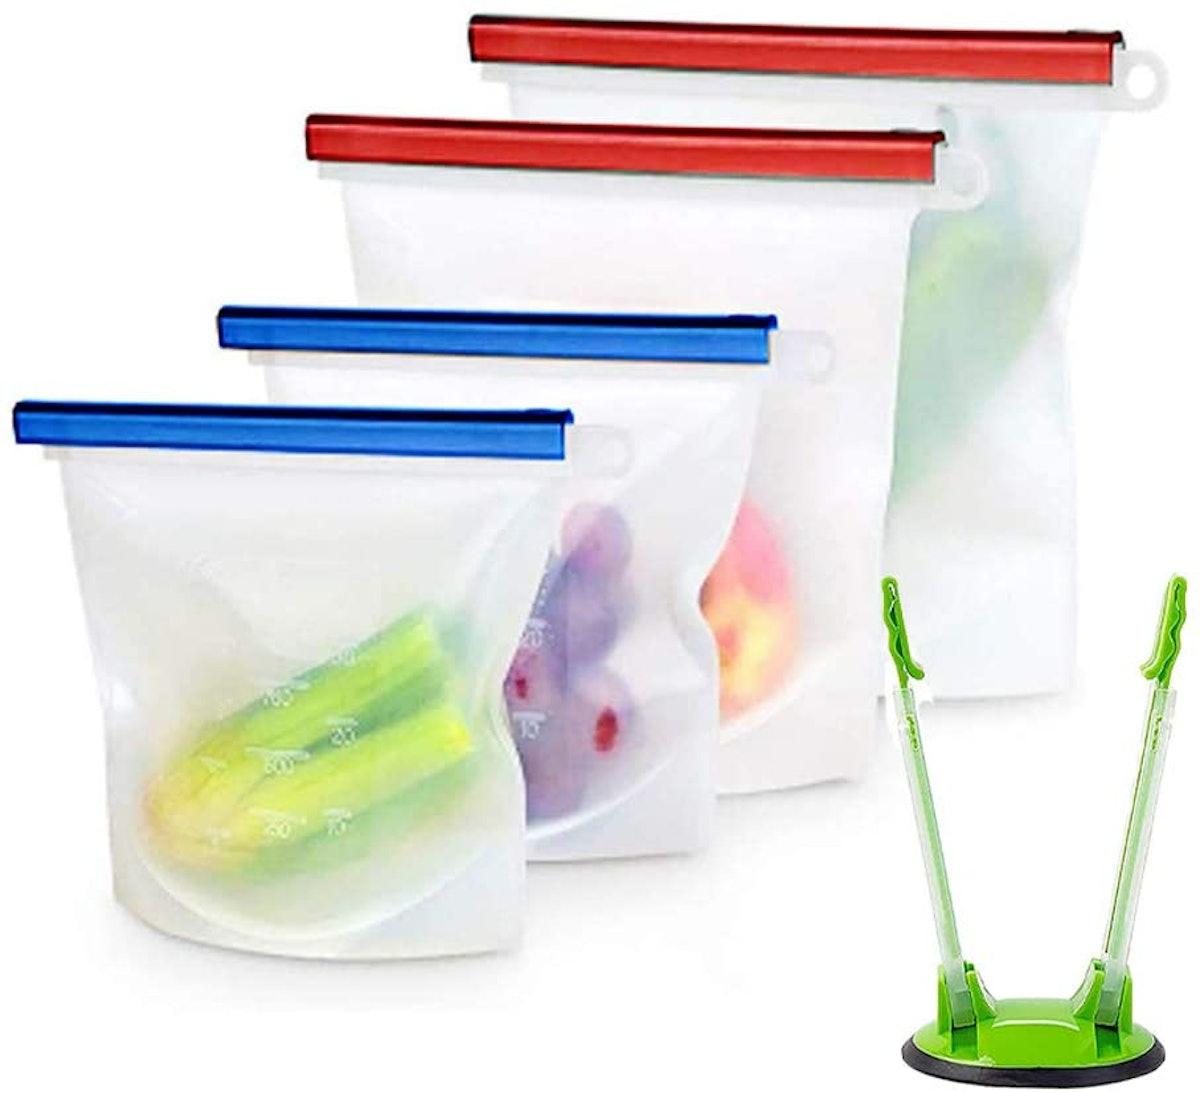 Ubrand Silicone Storage Bag (4-Pack)